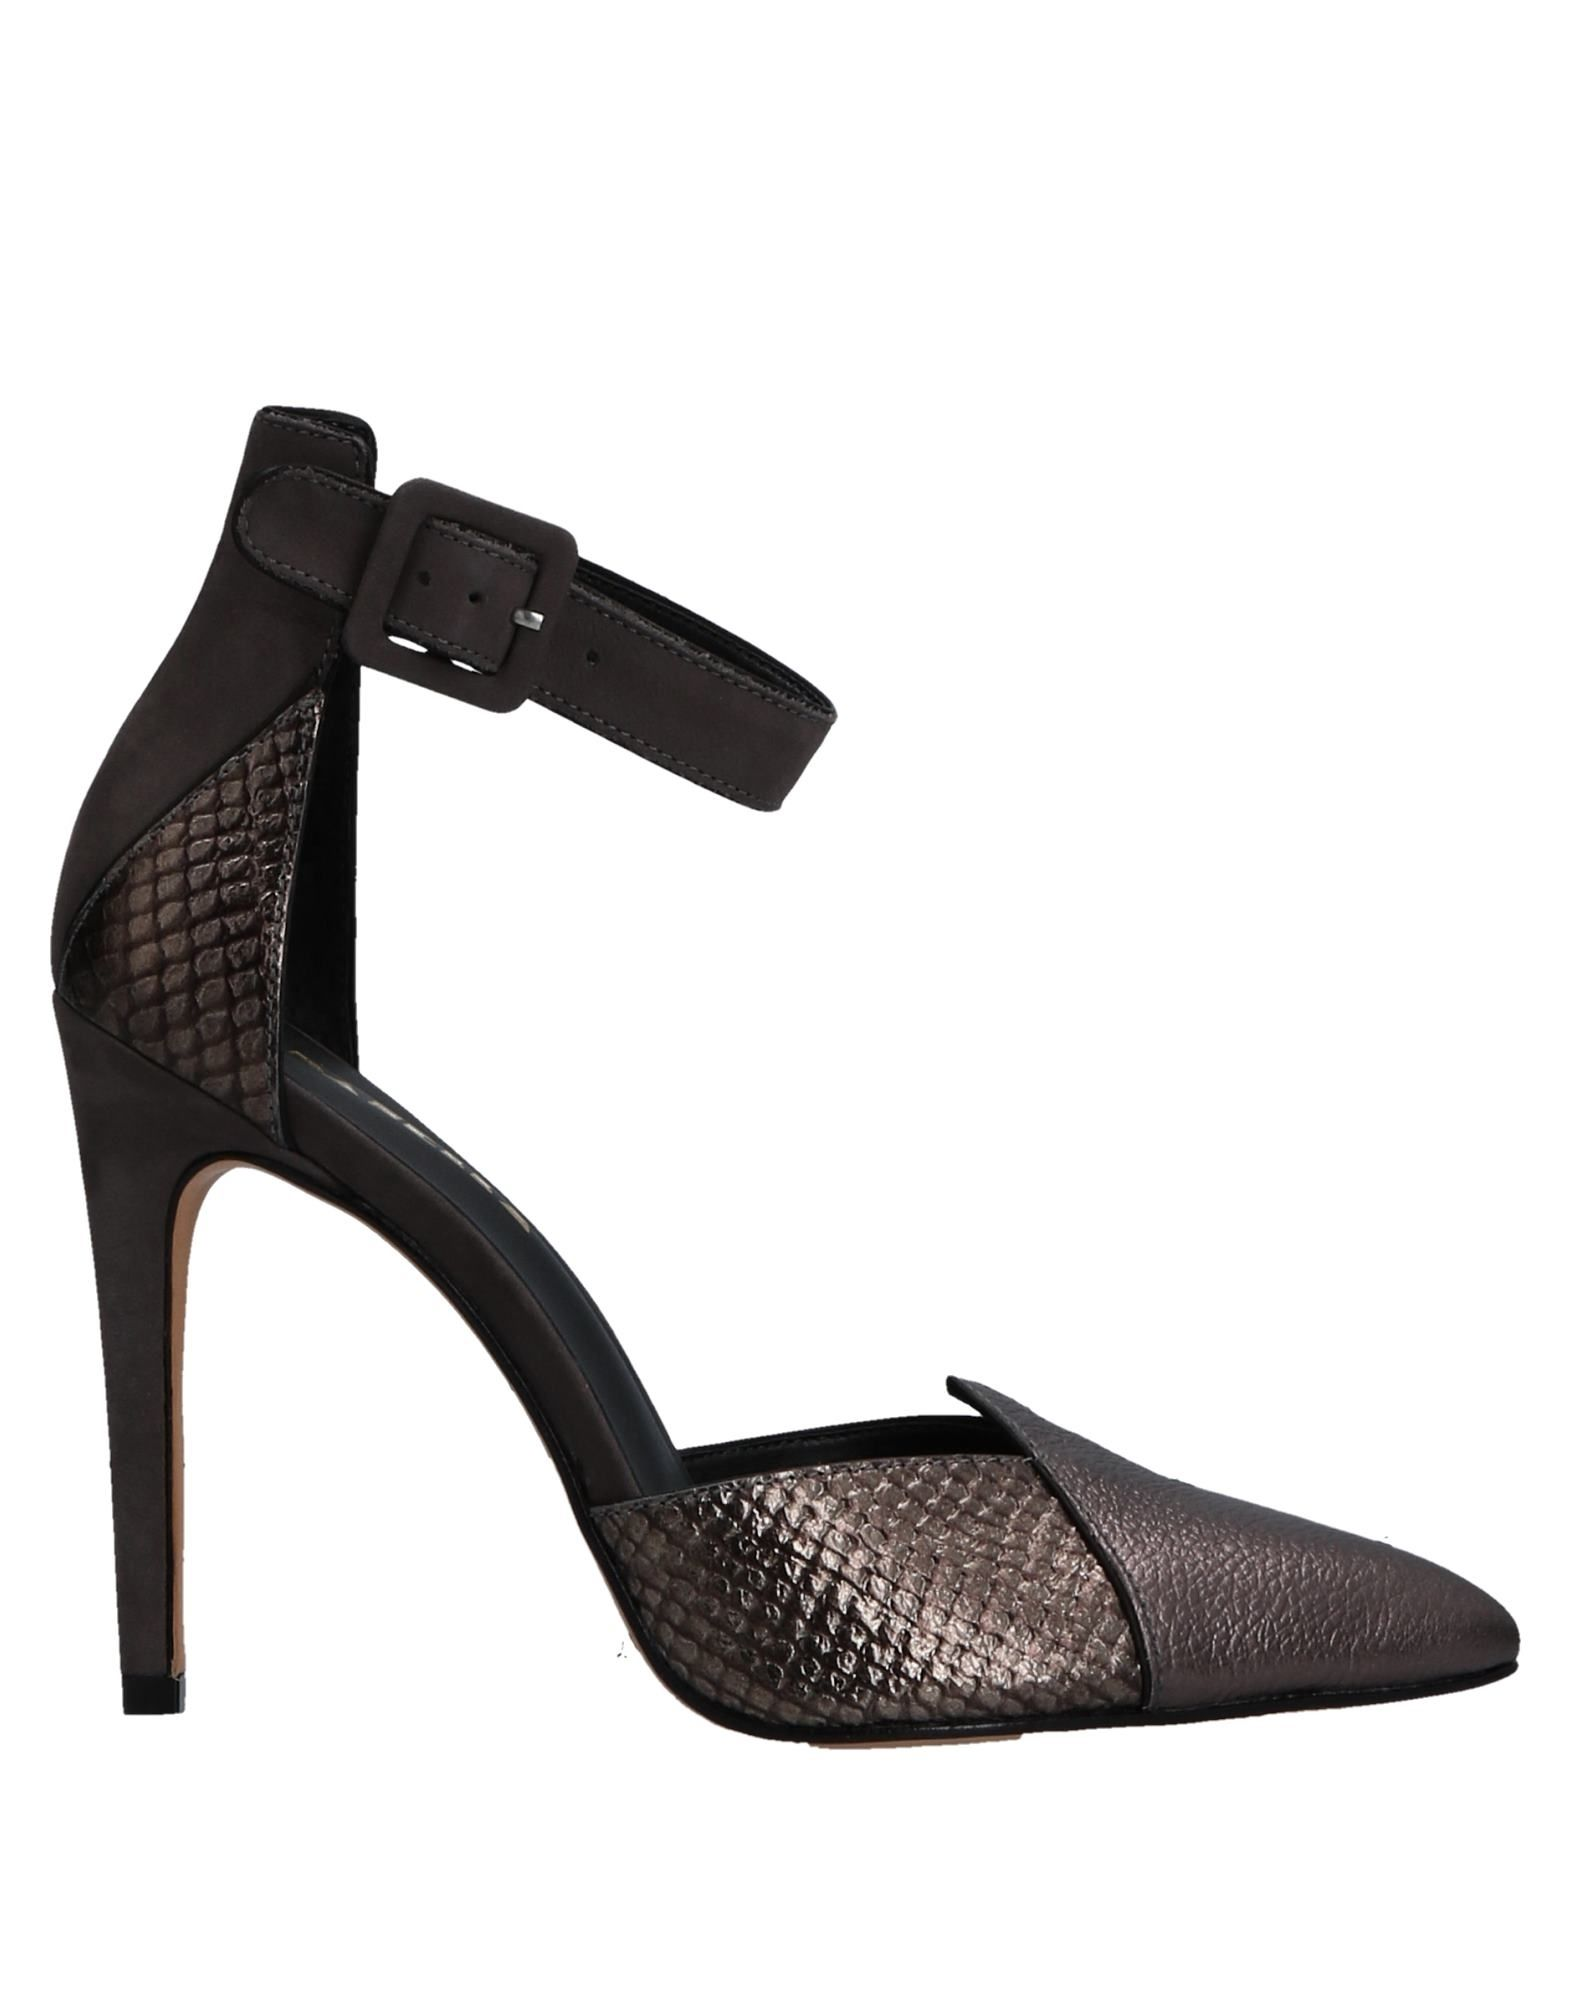 Panella Pumps Gute Damen  11526774ND Gute Pumps Qualität beliebte Schuhe 558c75